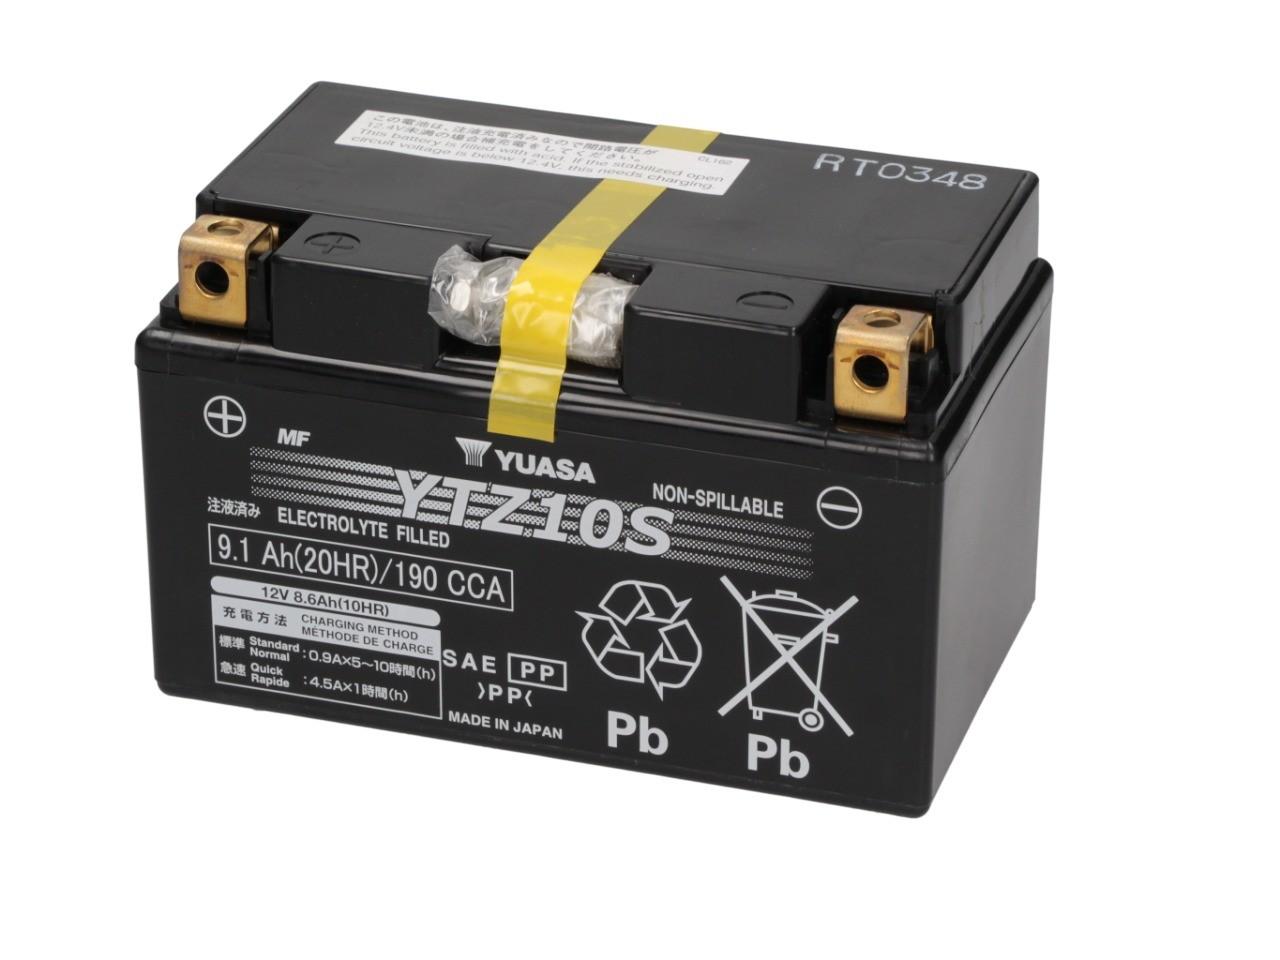 Batterie 12V YTZ10S YUASA (Prête à monter)